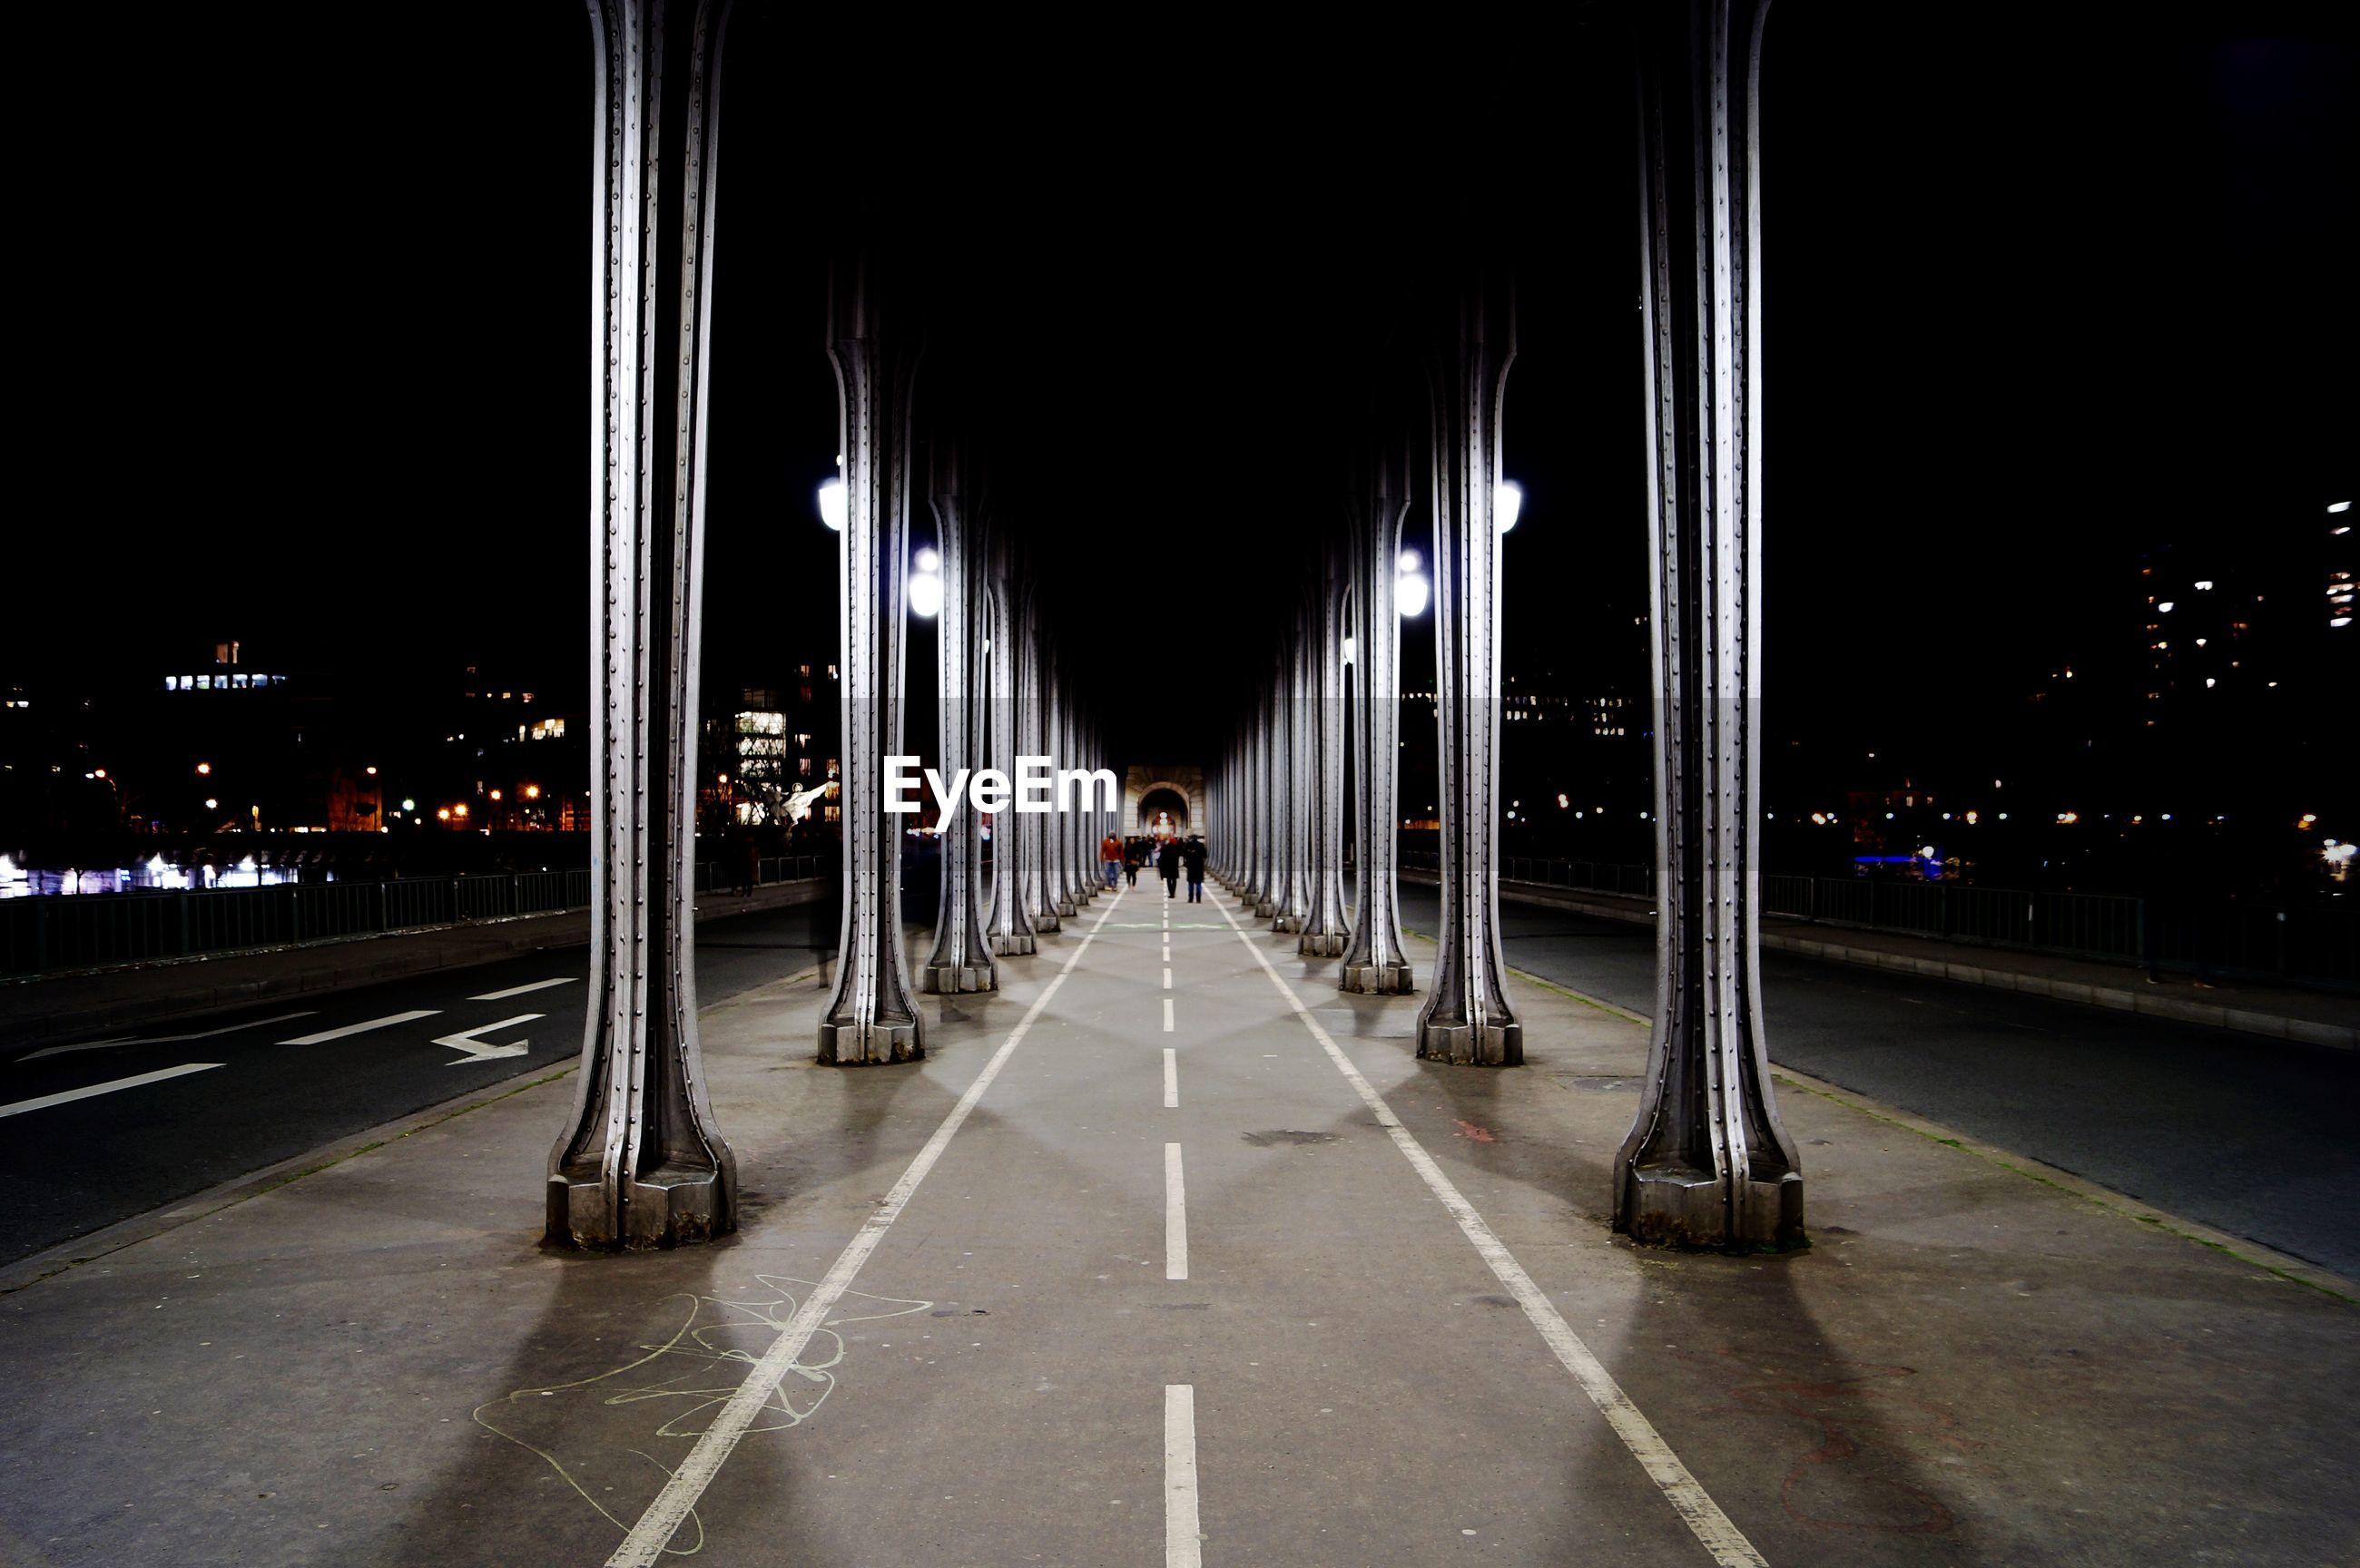 View of illuminated road under bridge in city at night